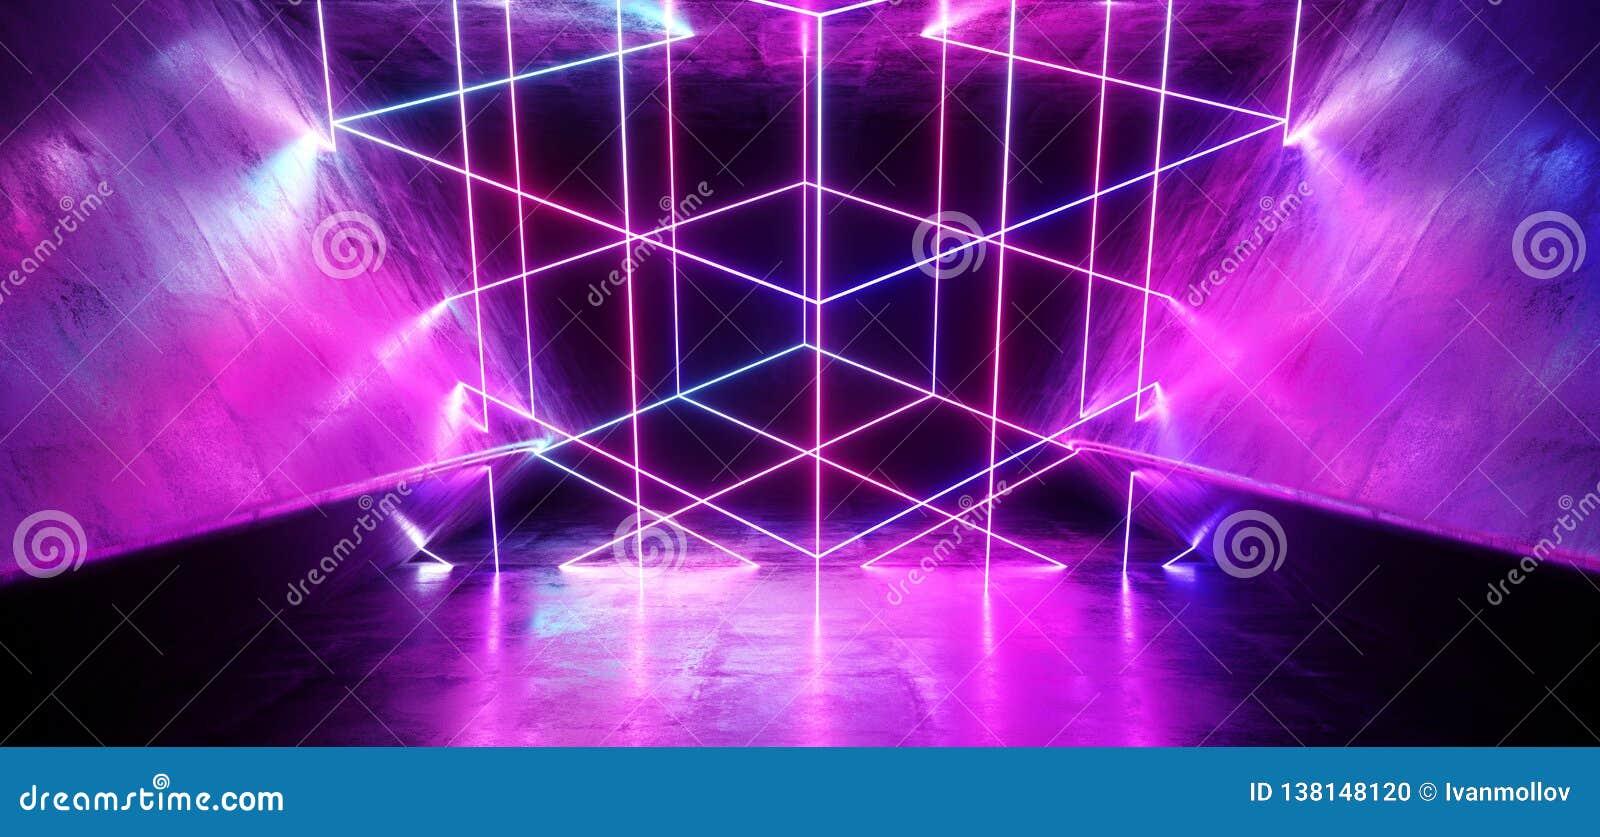 Tremendous Neon Abstract Laser Glowing Cyber Sci Fi Futuristic Modern Download Free Architecture Designs Scobabritishbridgeorg